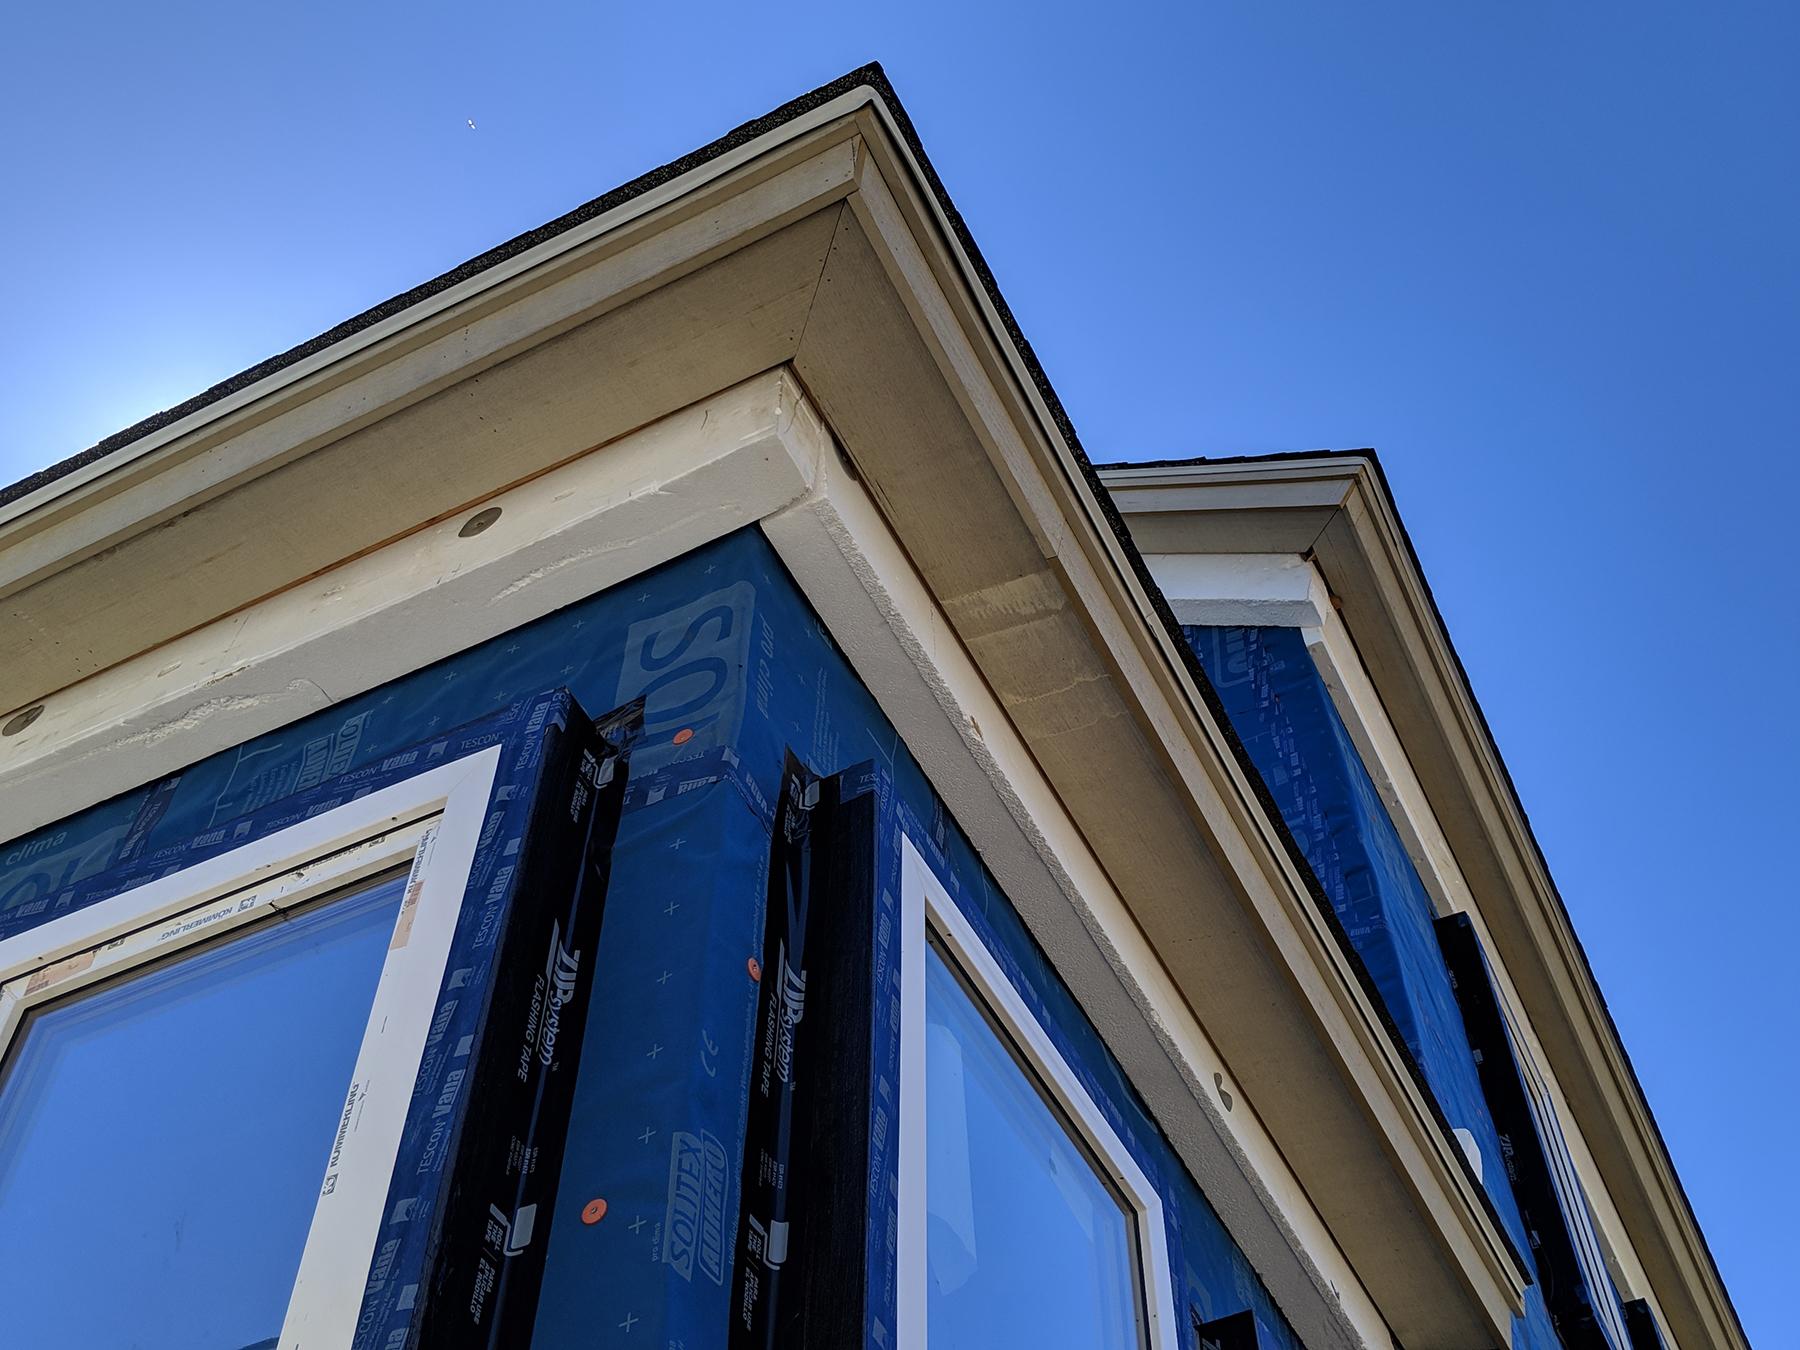 4.24.19 Westchester Passive House corner window.jpg